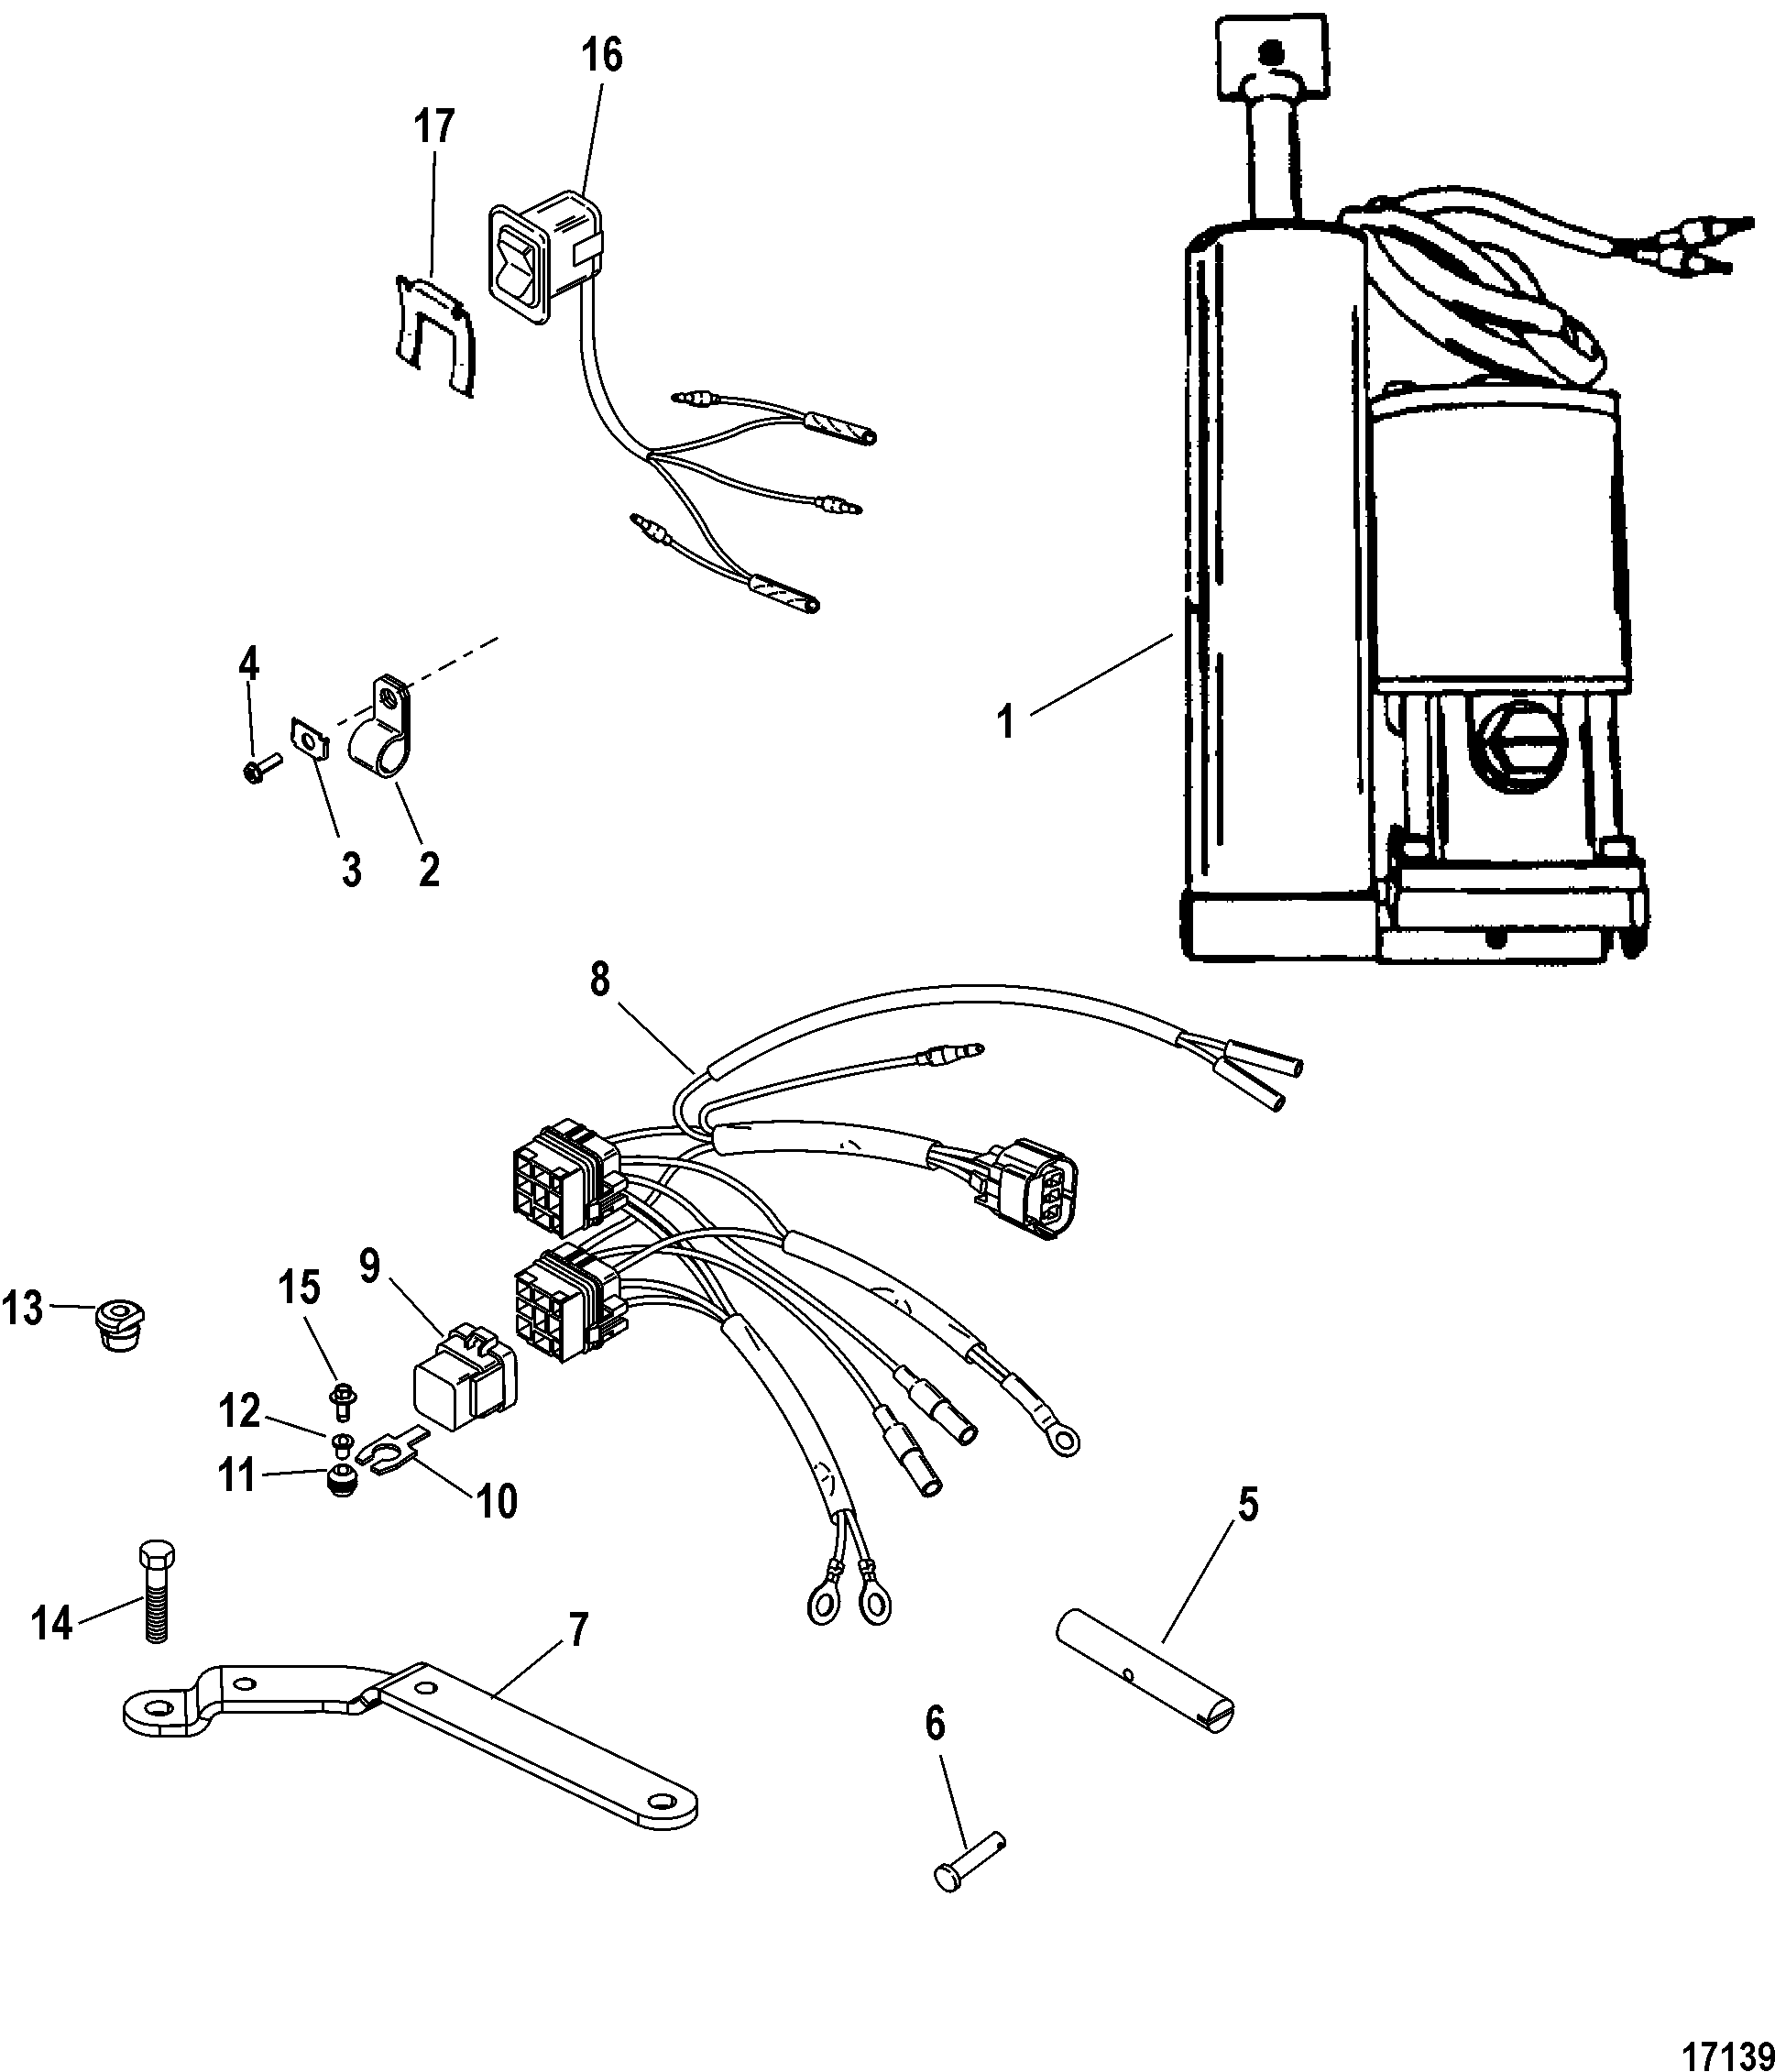 Power Trim Kit A8 A6 For Trim Tilt Lift